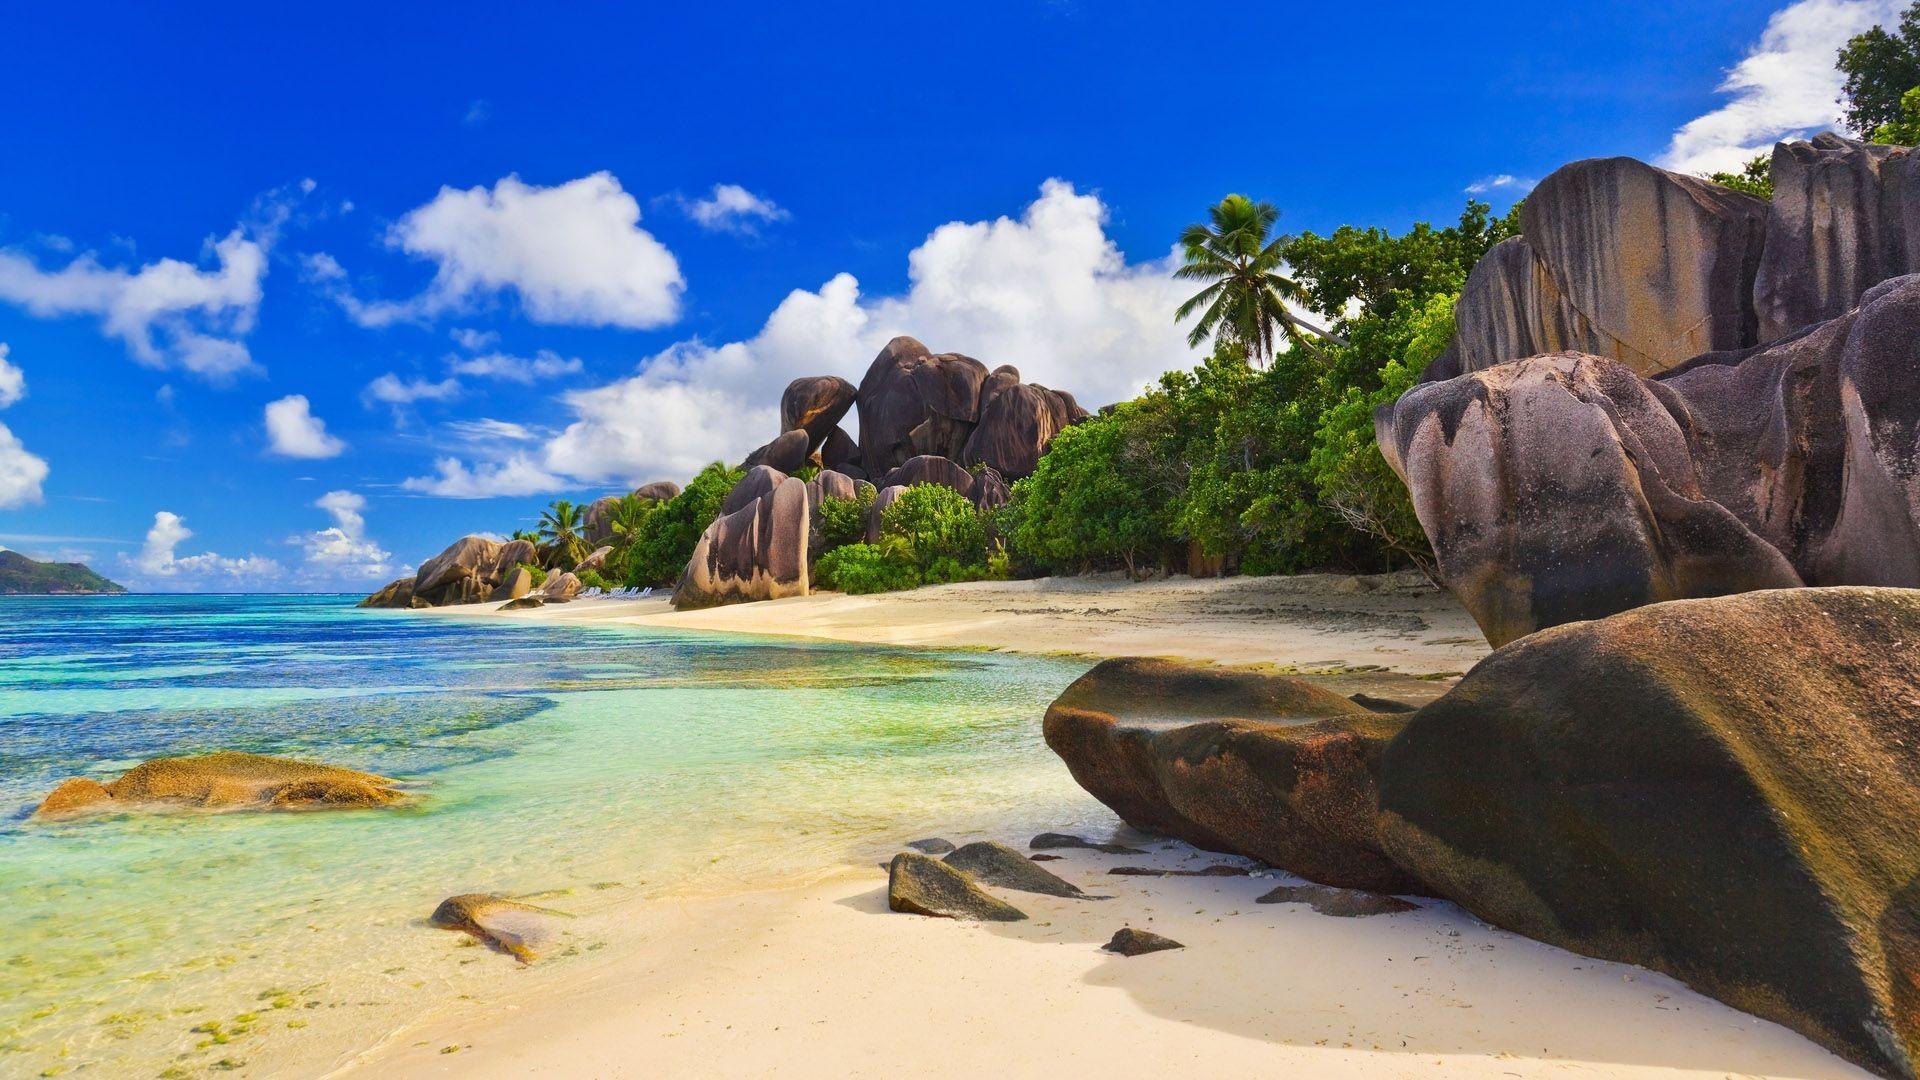 Beach Desktop Backgrounds Best HD Desktop Wallpapers .